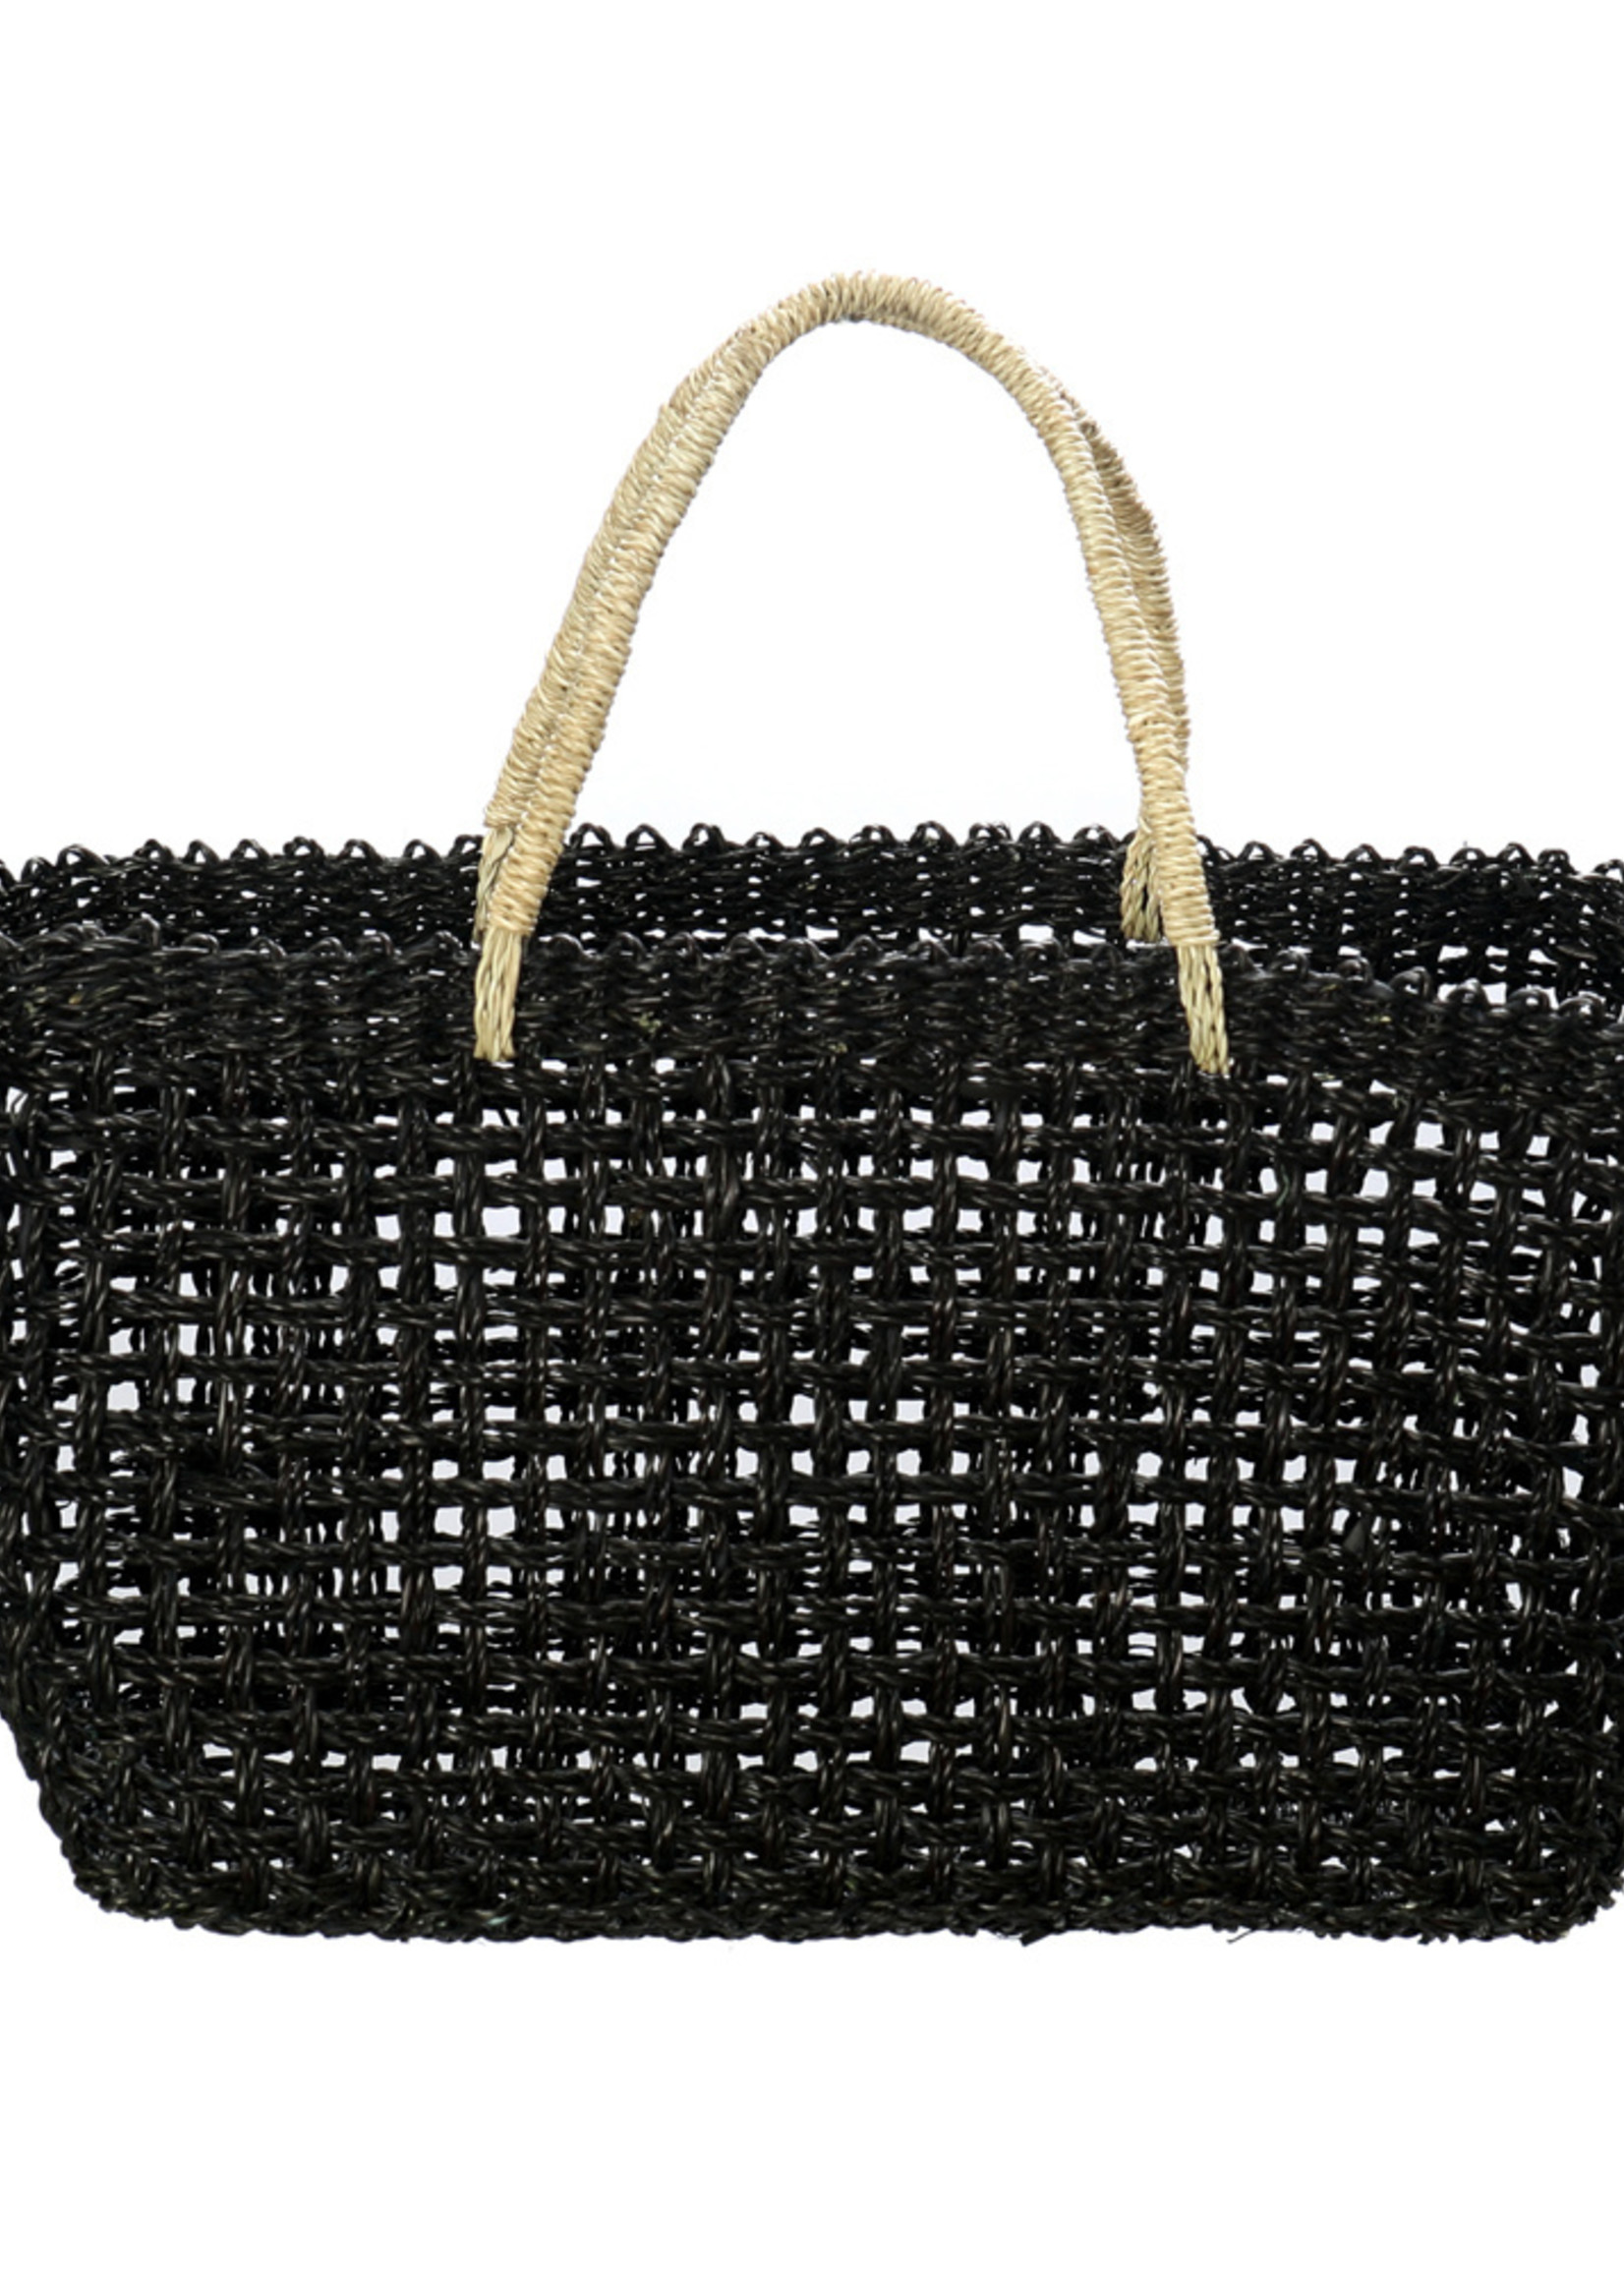 The Seagrass Market Basket - Black Natural - M